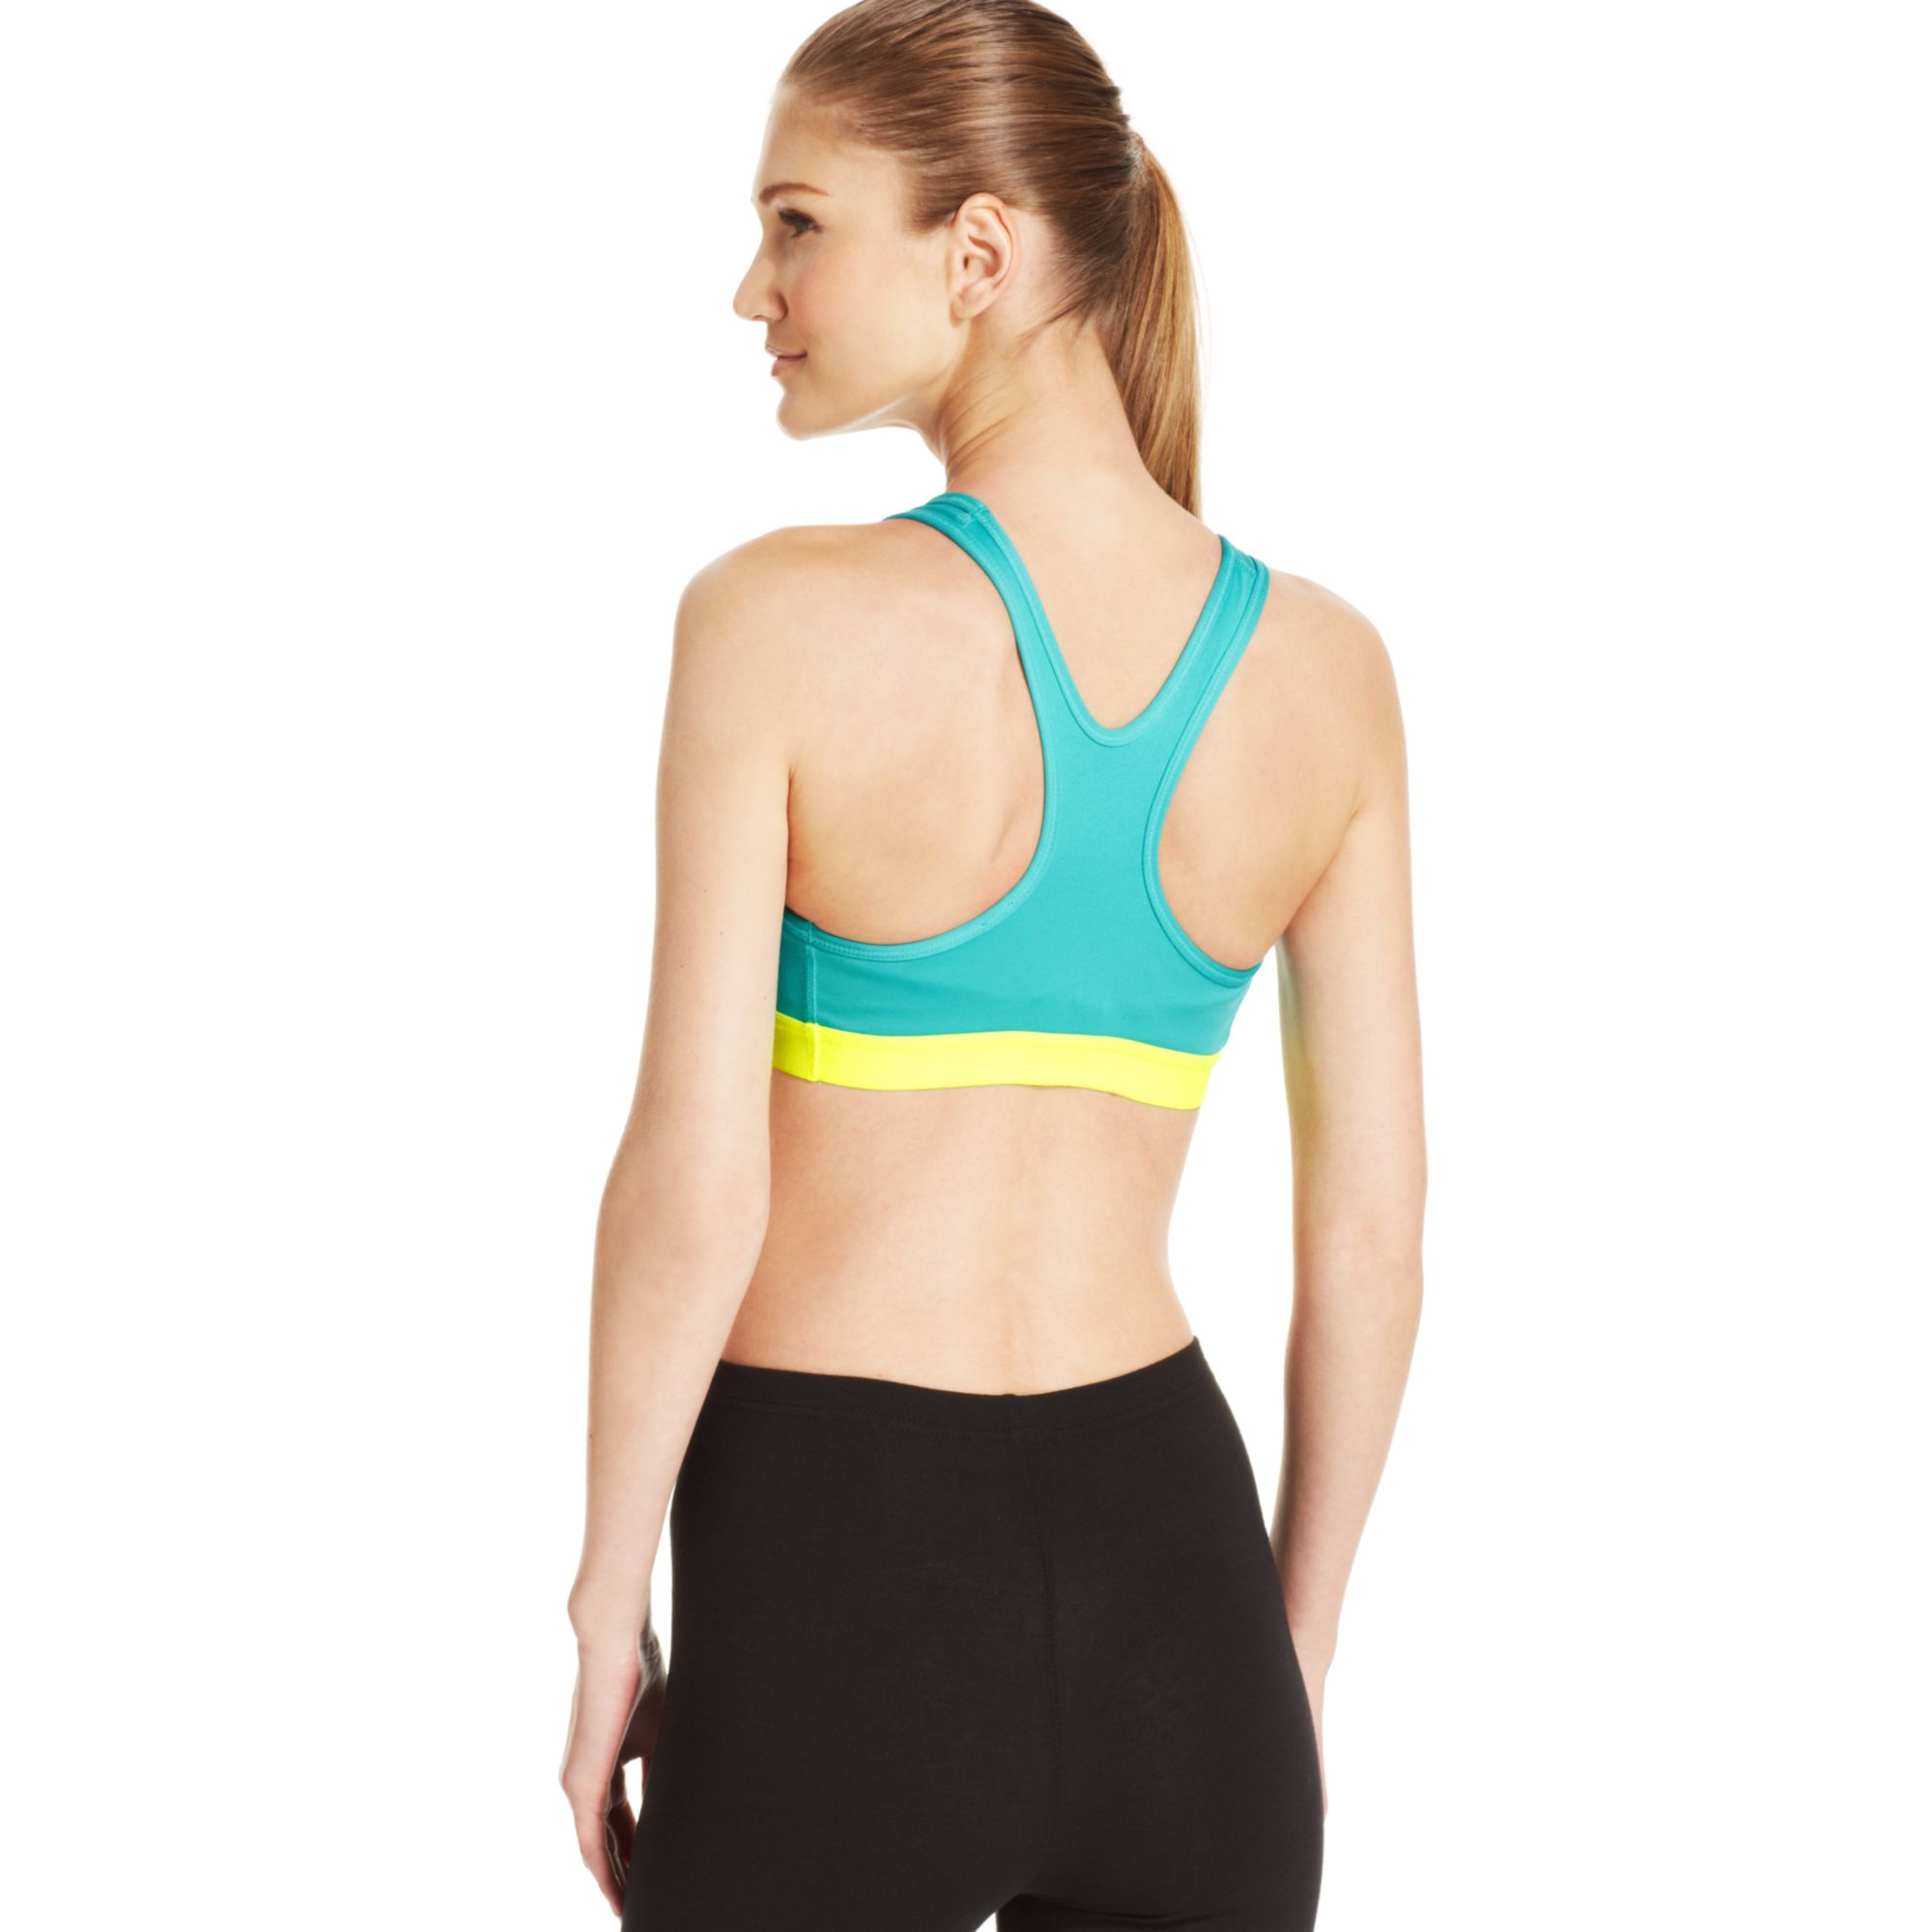 padded sports bra